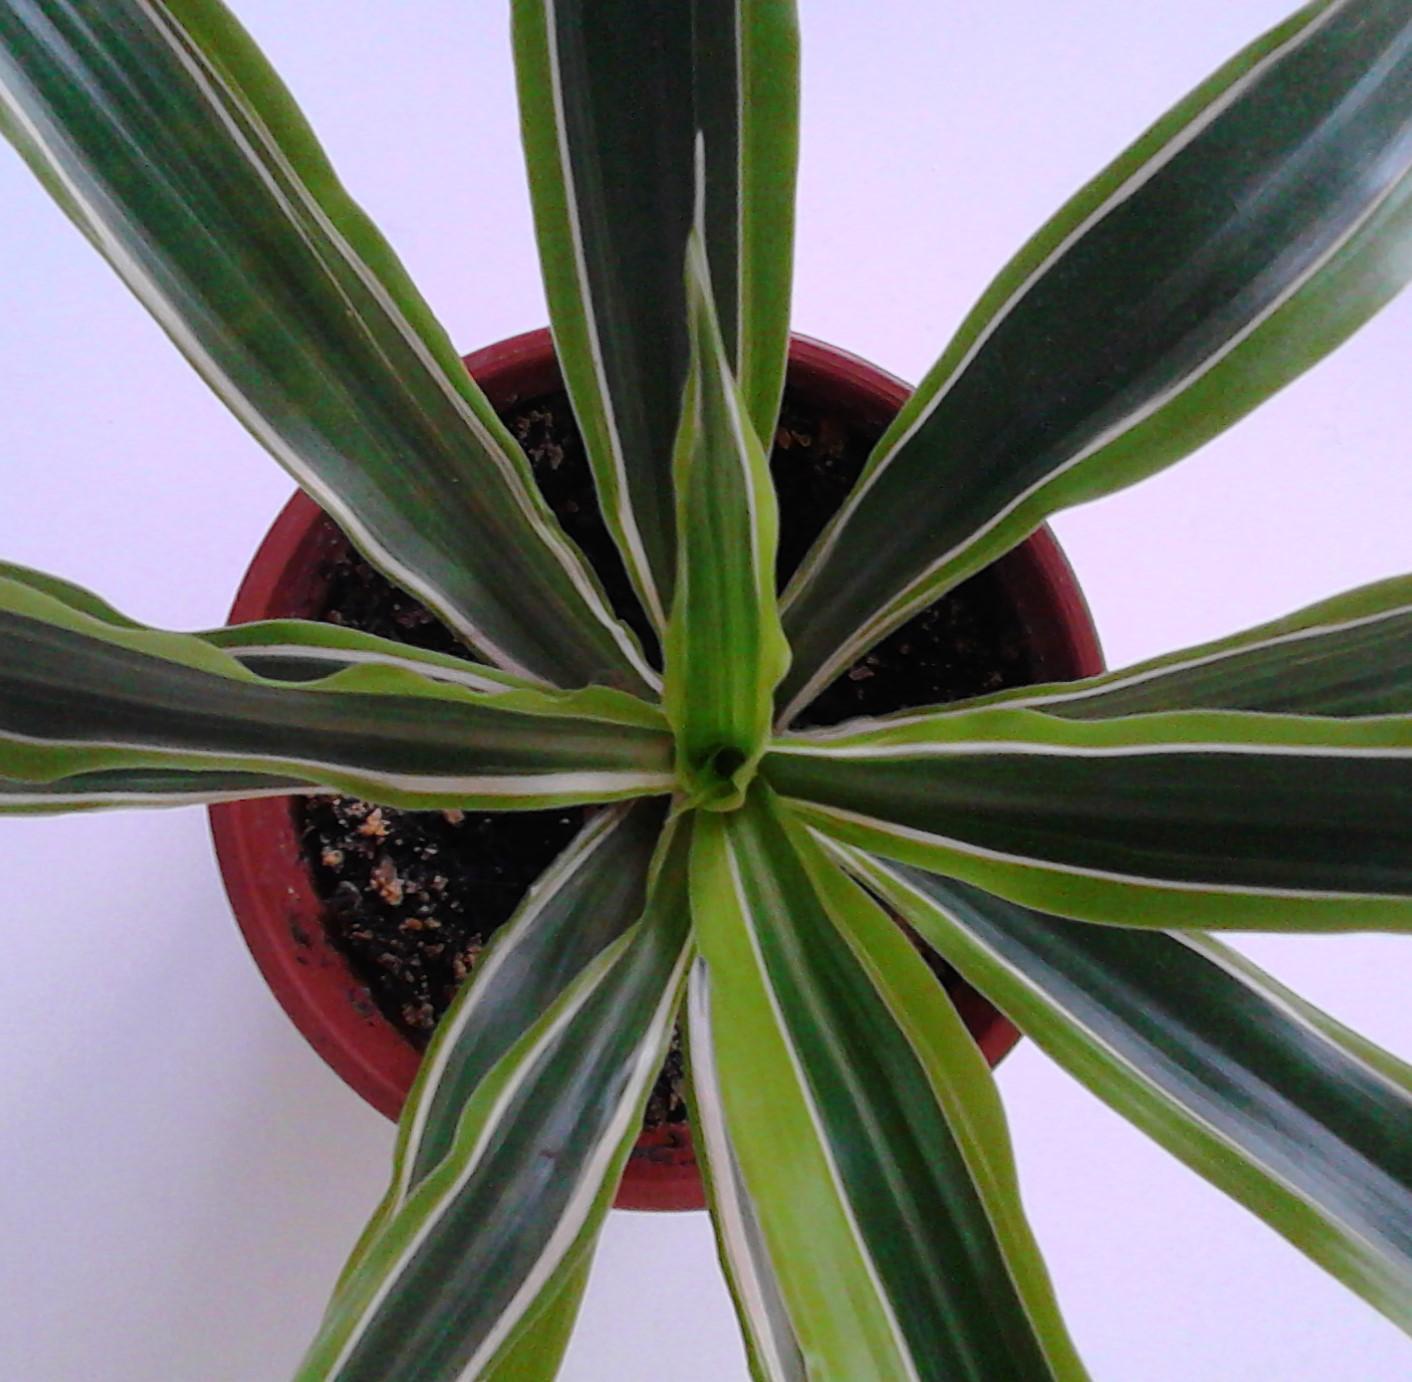 La ventana de javiruli plantas de interior 35 dracena - Plantas de interior ...